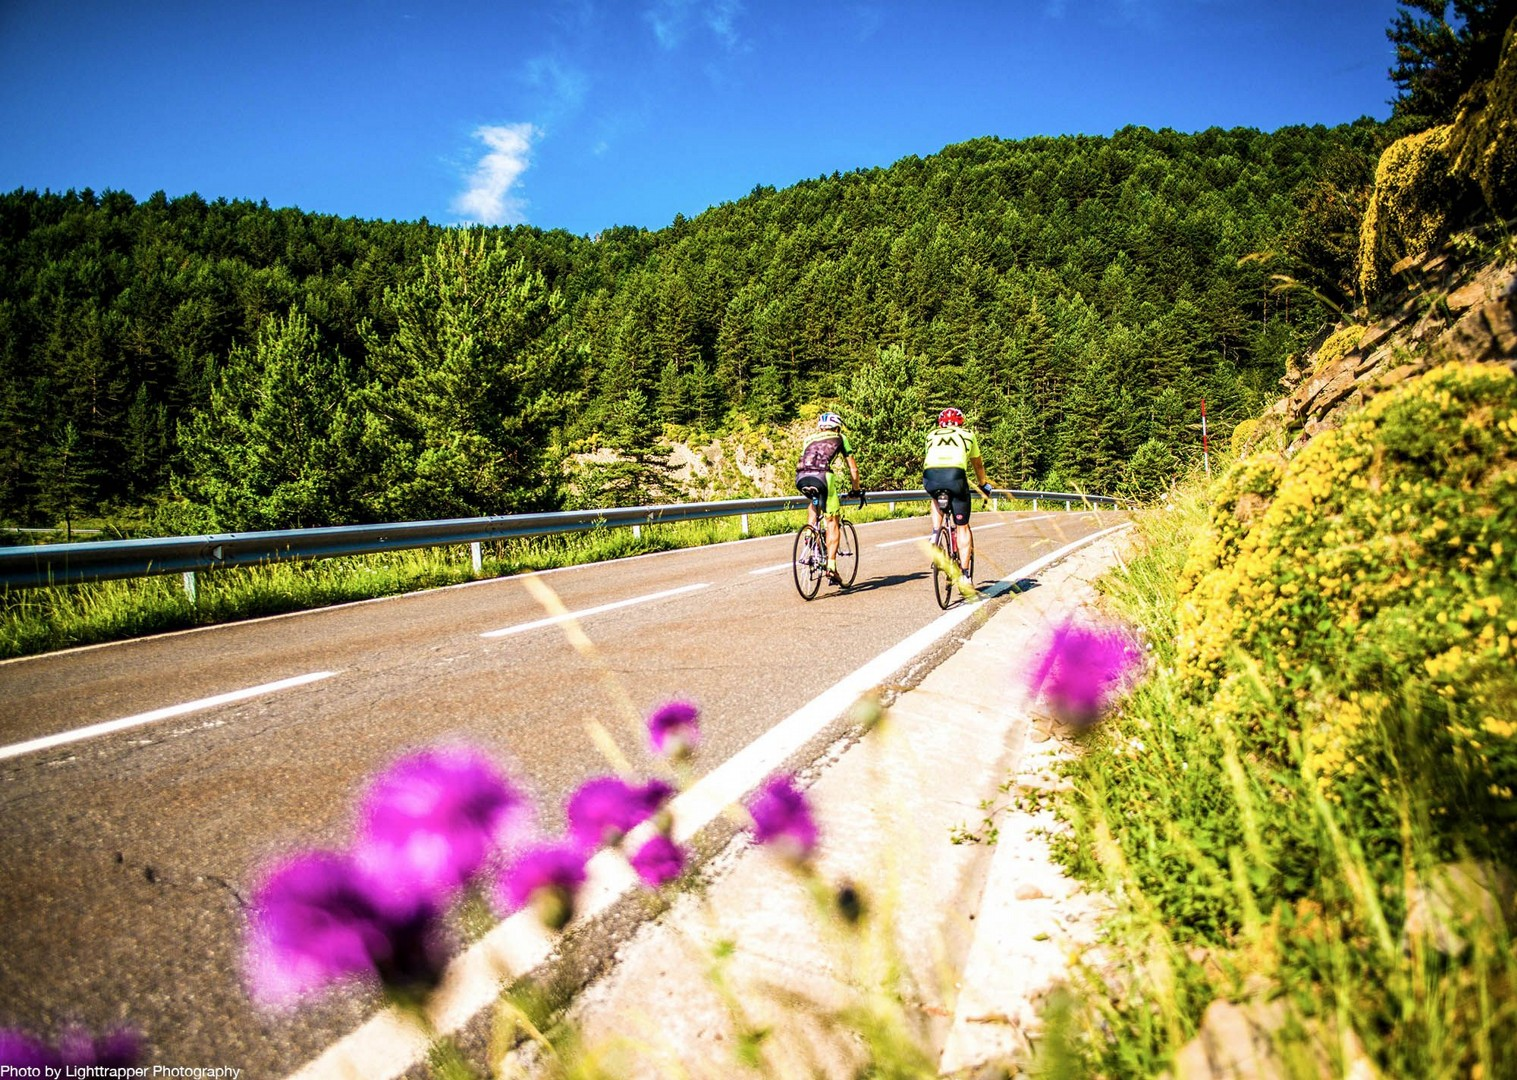 road-cycling-holiday-france-week-pyrenees-saddle-skedaddle.jpg - France - Pyrenees Fitness Week (Grade 2-3) - Guided Road Cycling Holiday - Road Cycling